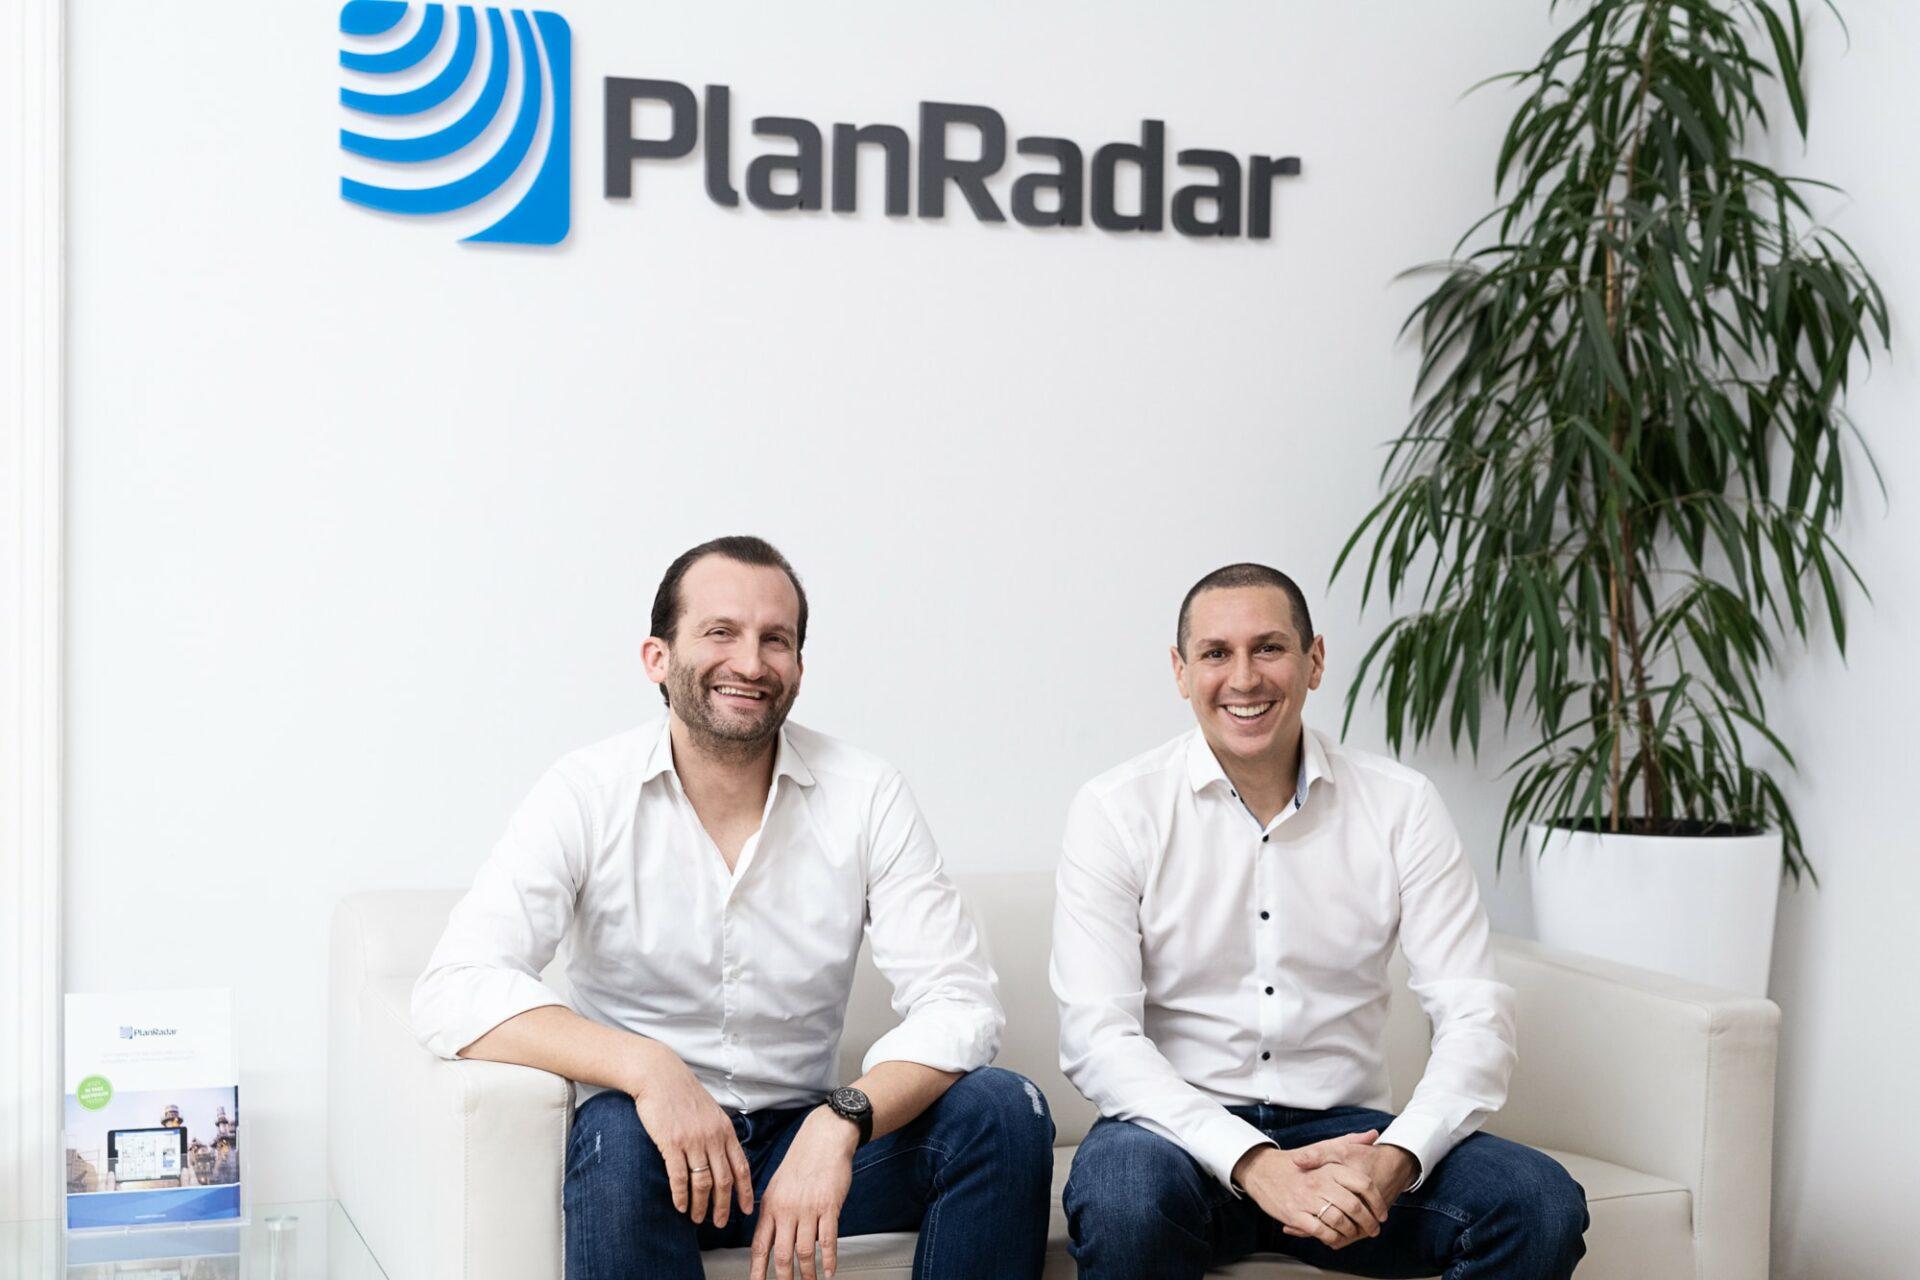 Ibrahim and Sander, PlanRadar